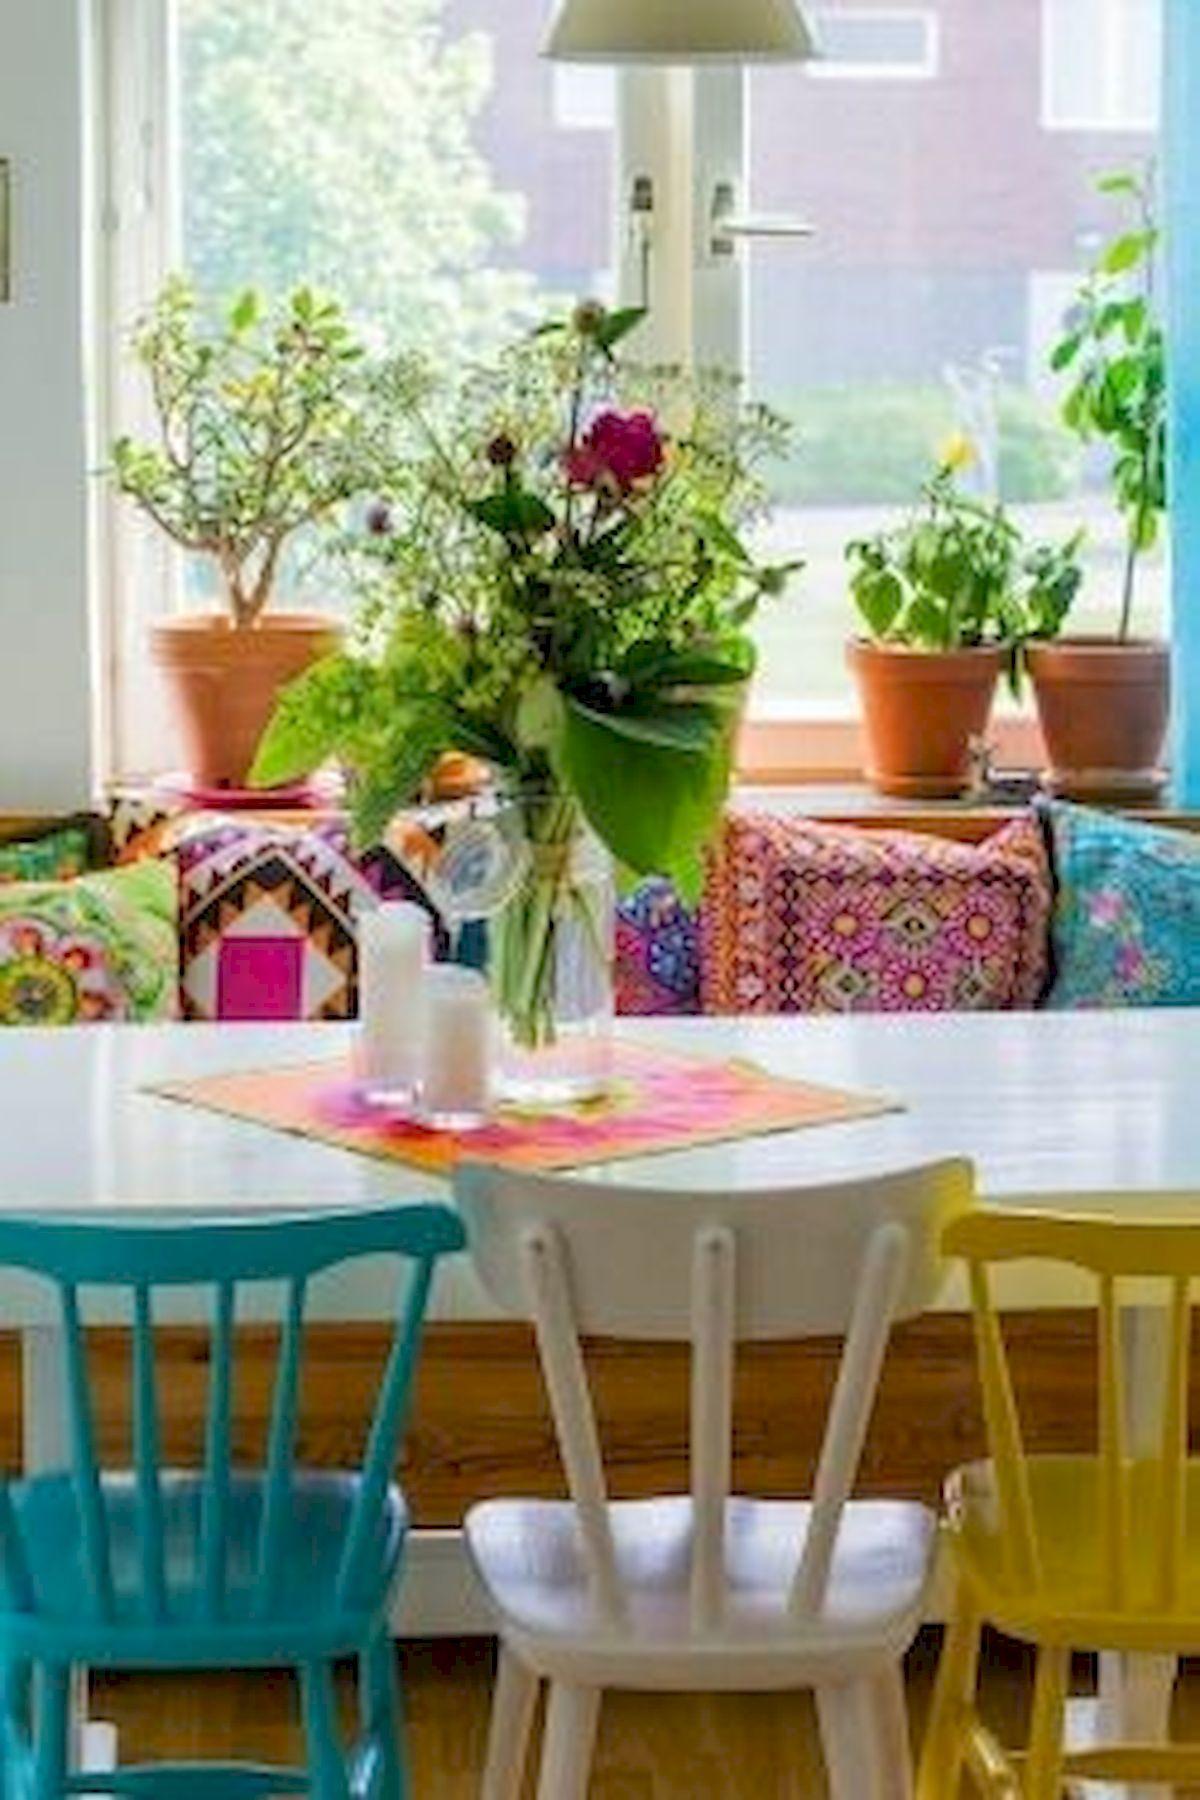 45 Colorful Interior Home Design and Decor Ideas (39)